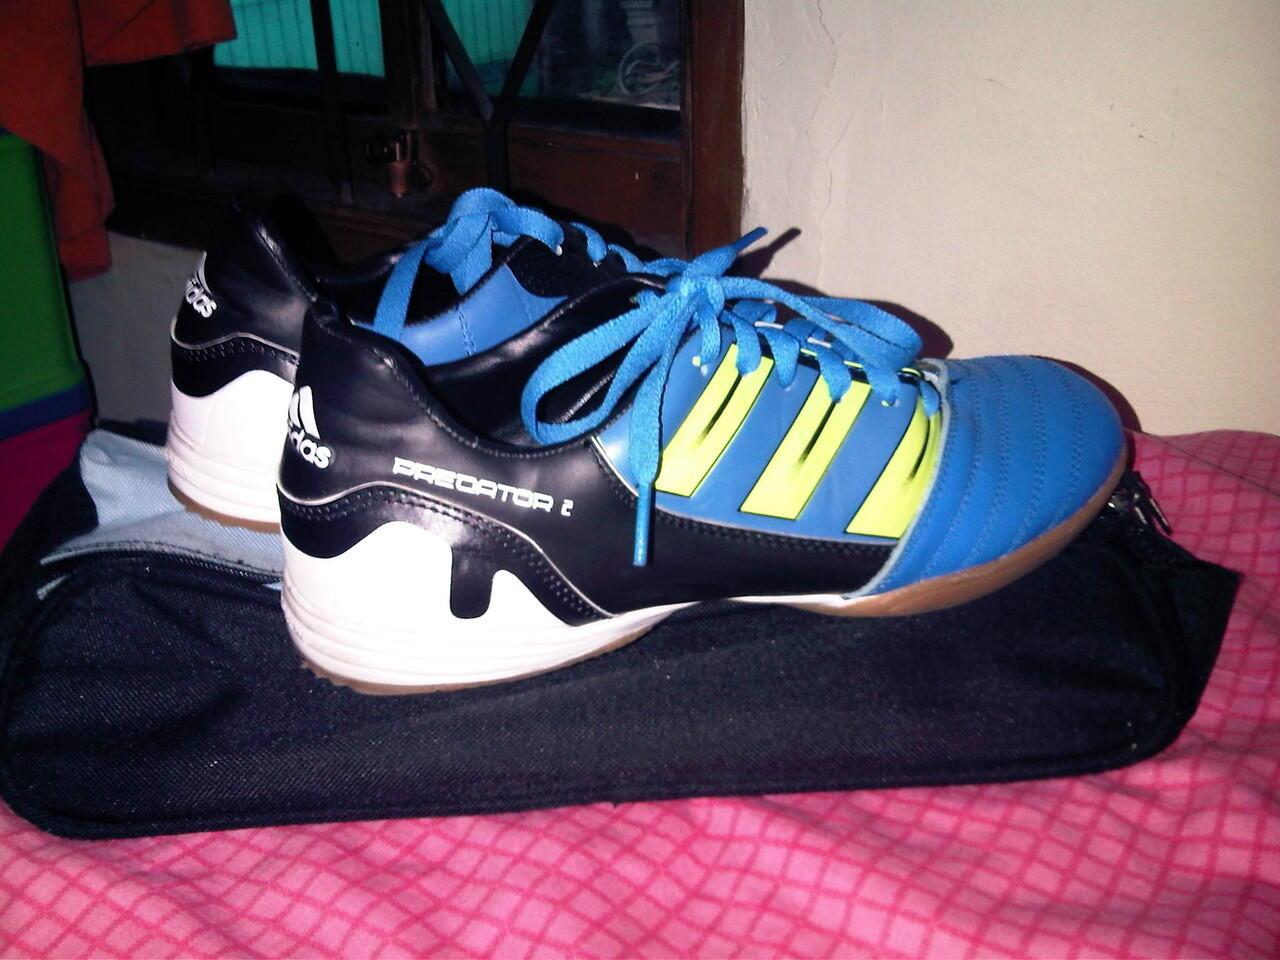 ... get sepatu futsal adidas predator 2 kw italy dekker adidas 1ede6 a2526 8172602636